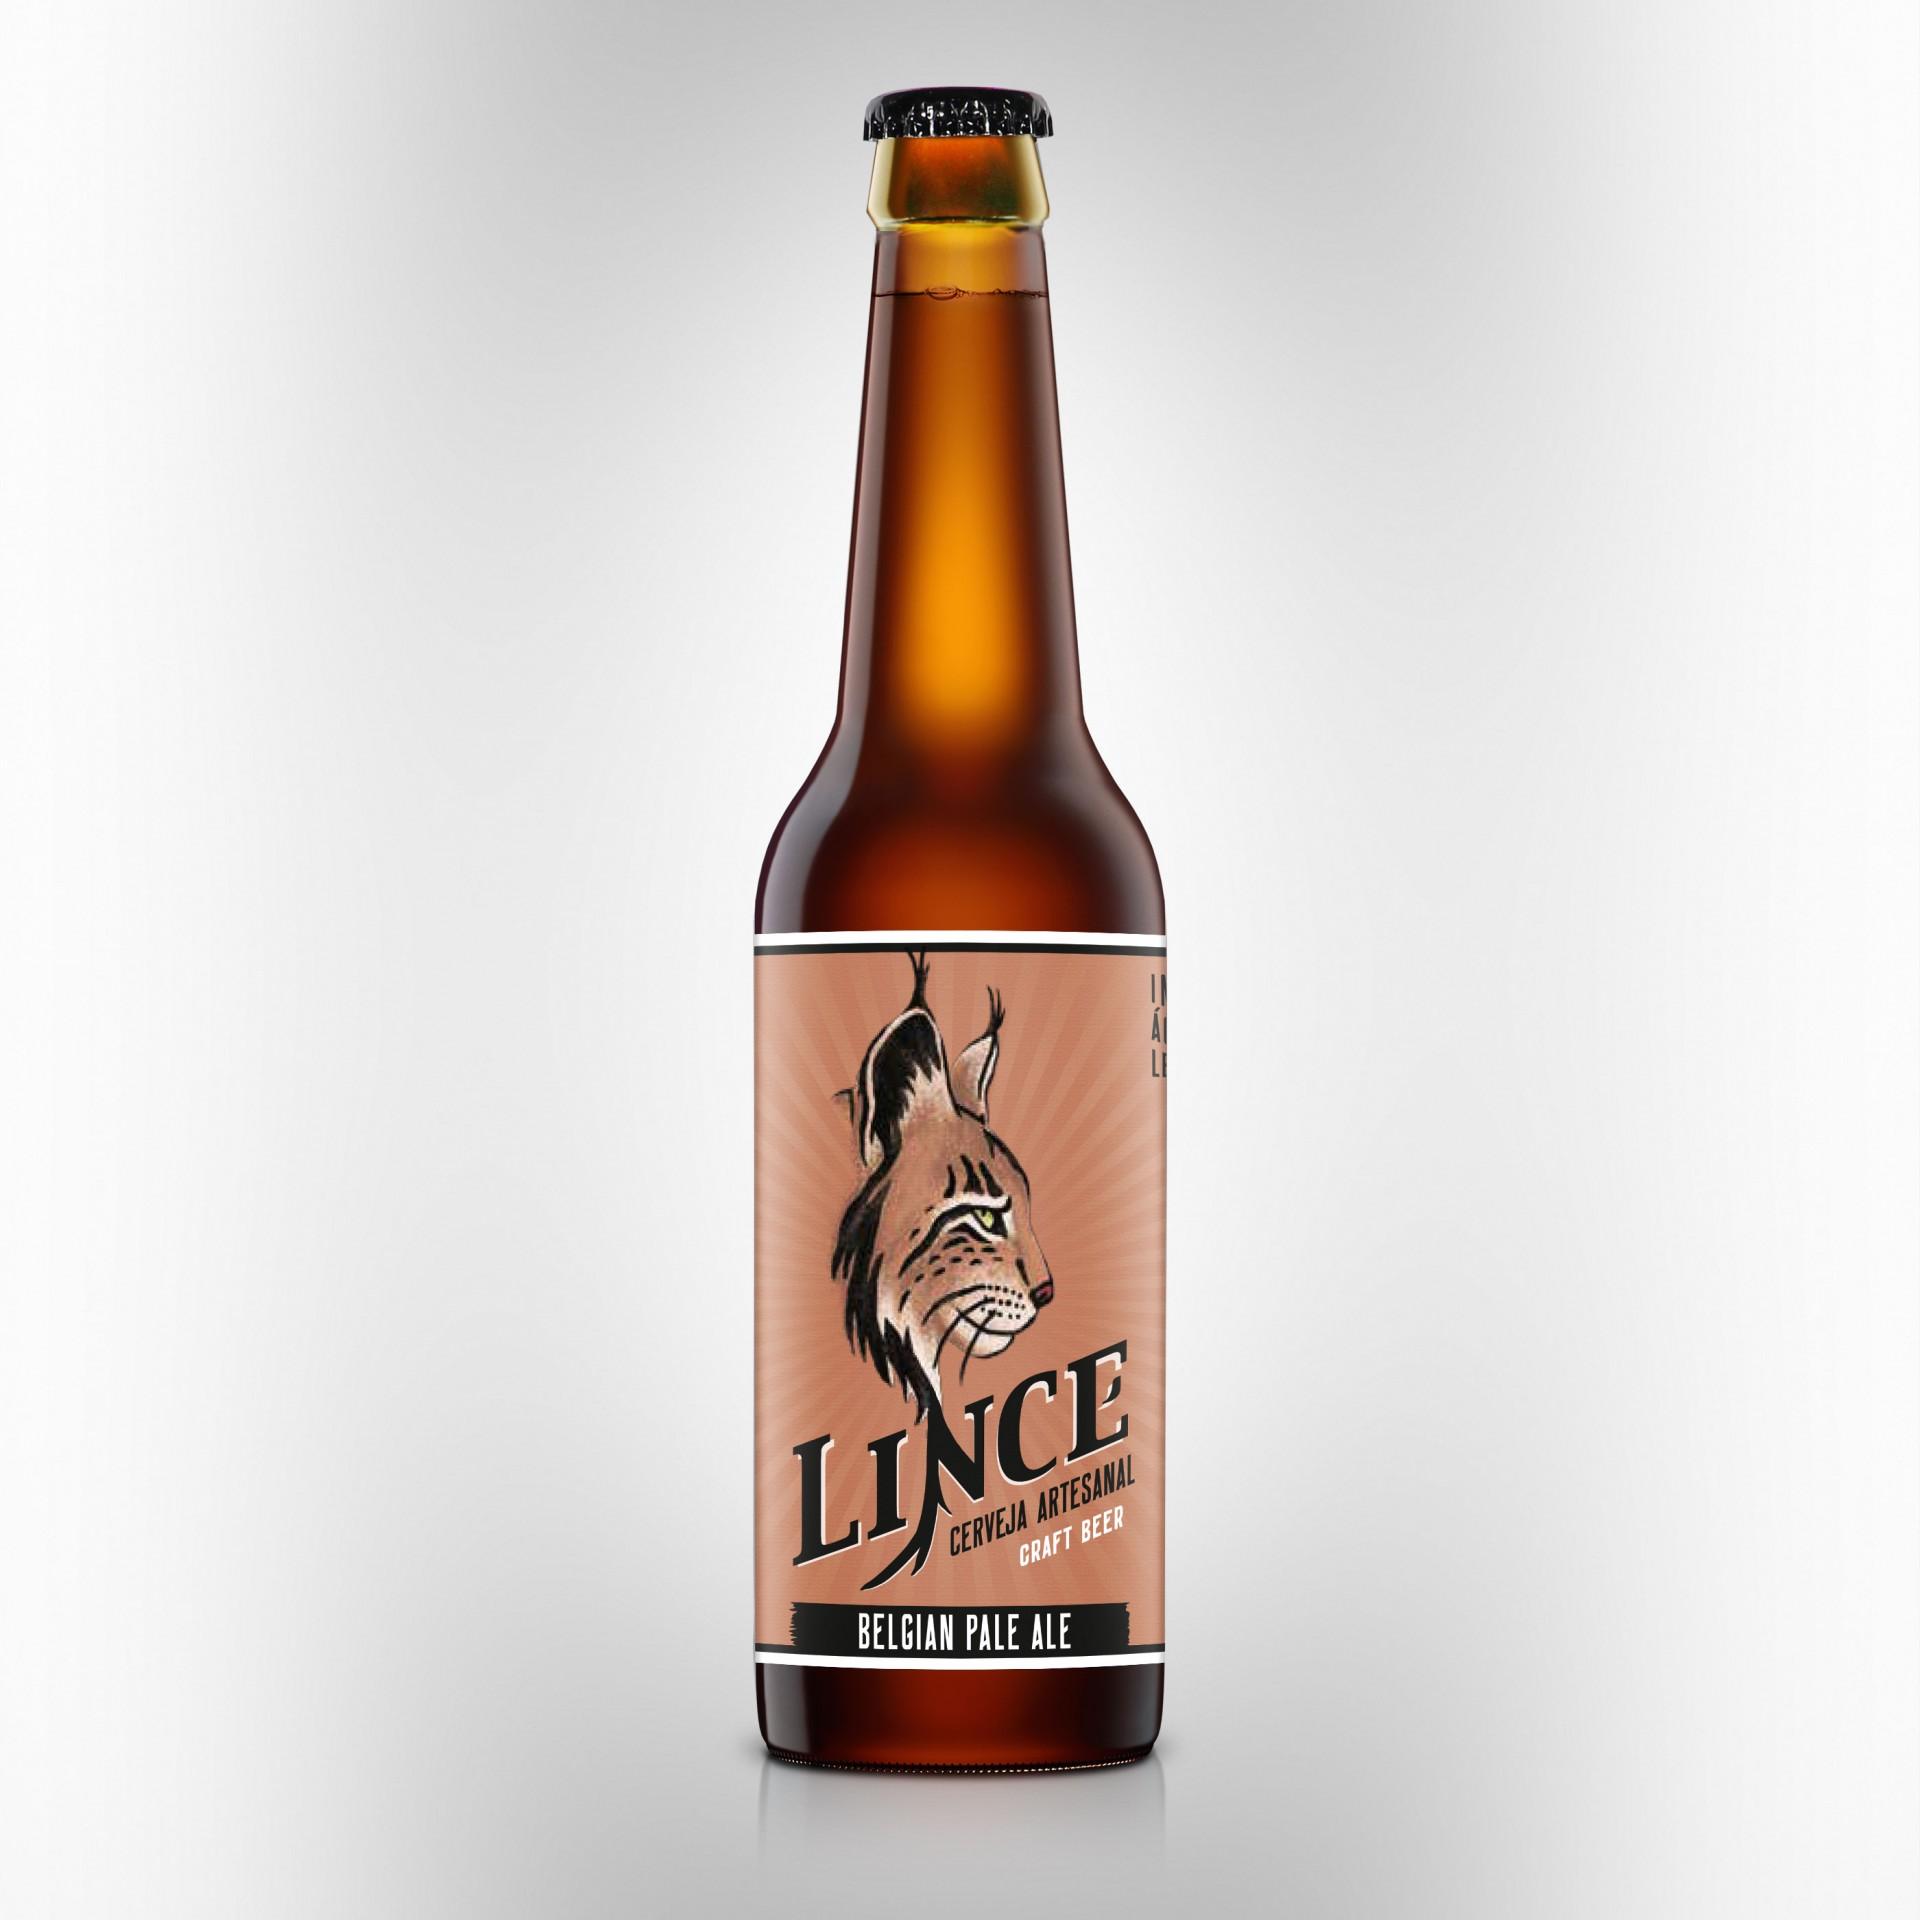 Pack 12 x Belgian Pale Ale